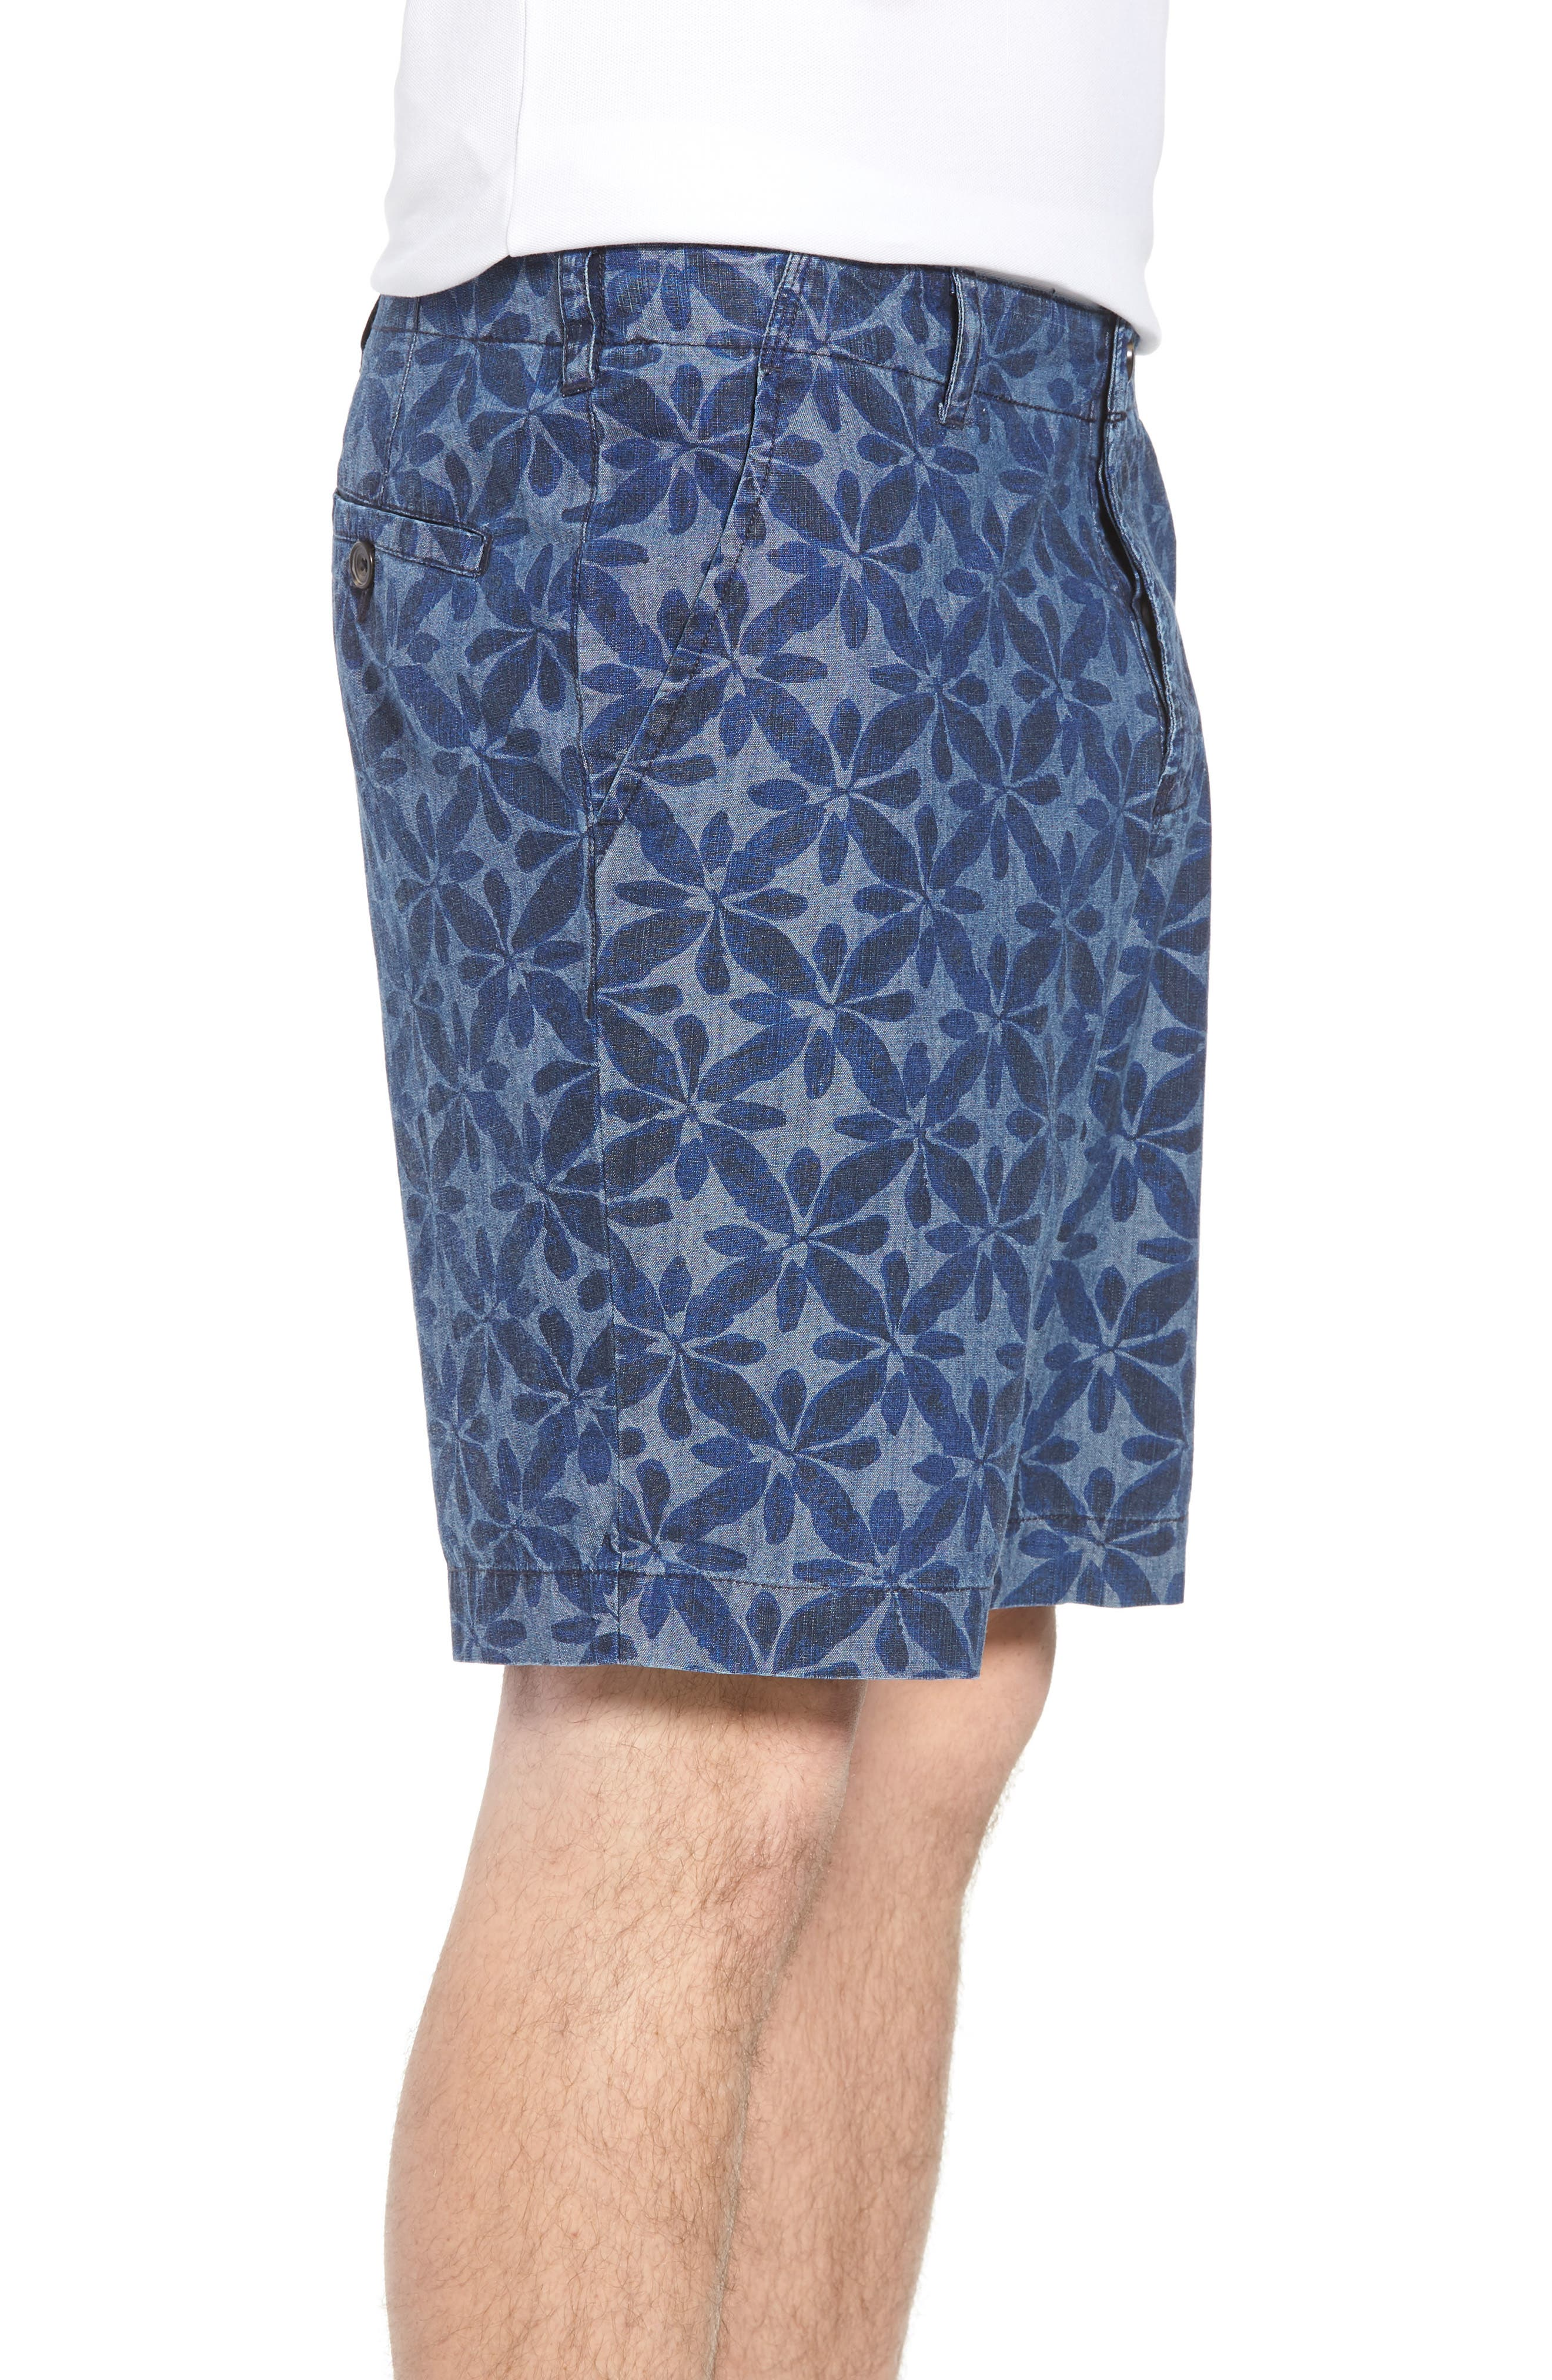 Franju Floral Cotton Shorts,                             Alternate thumbnail 3, color,                             Rinse And Softener